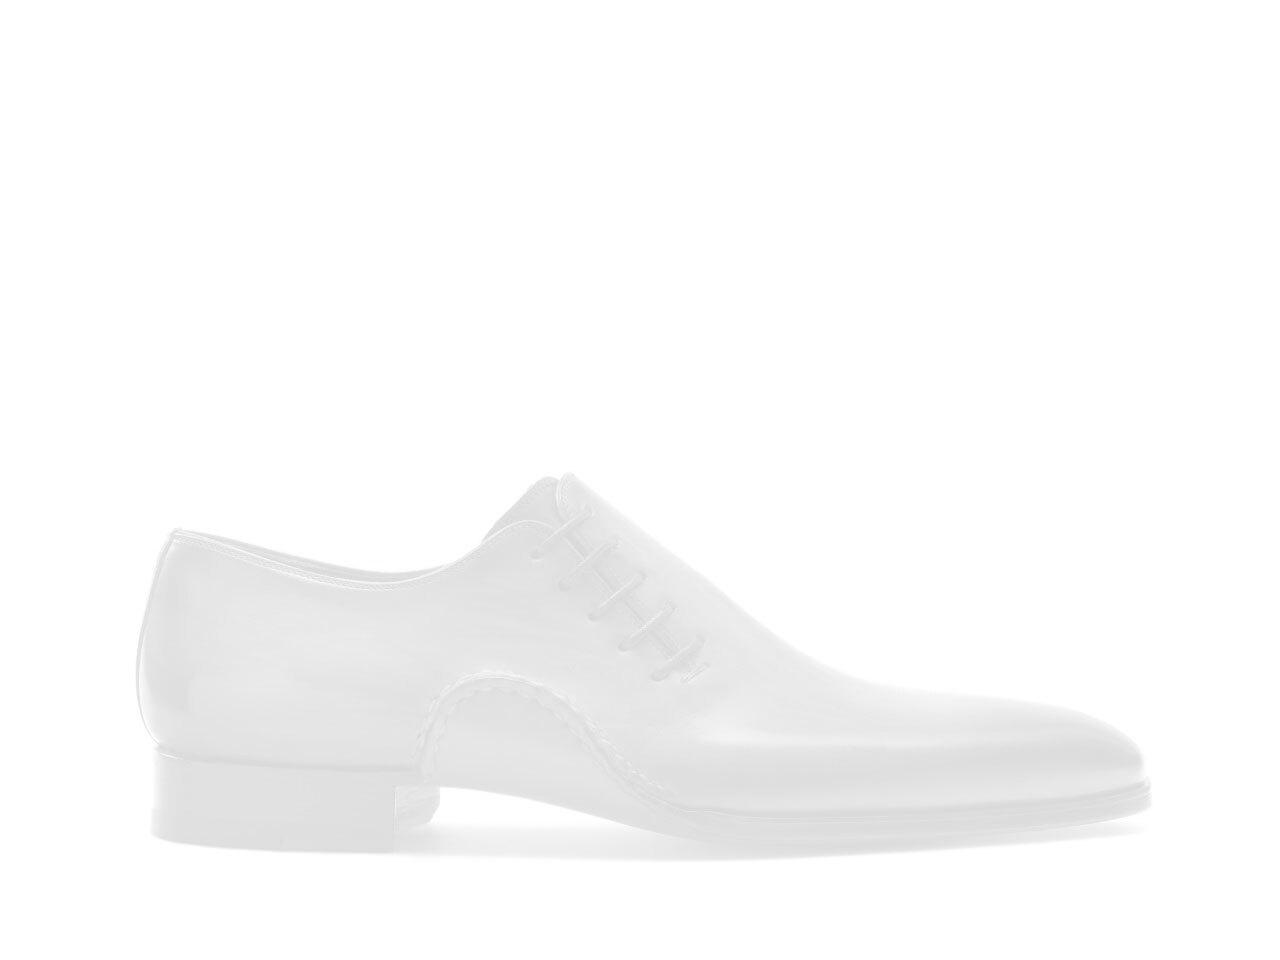 Pair of the Magnanni Marco Black Men's Single Monk Strap Shoes